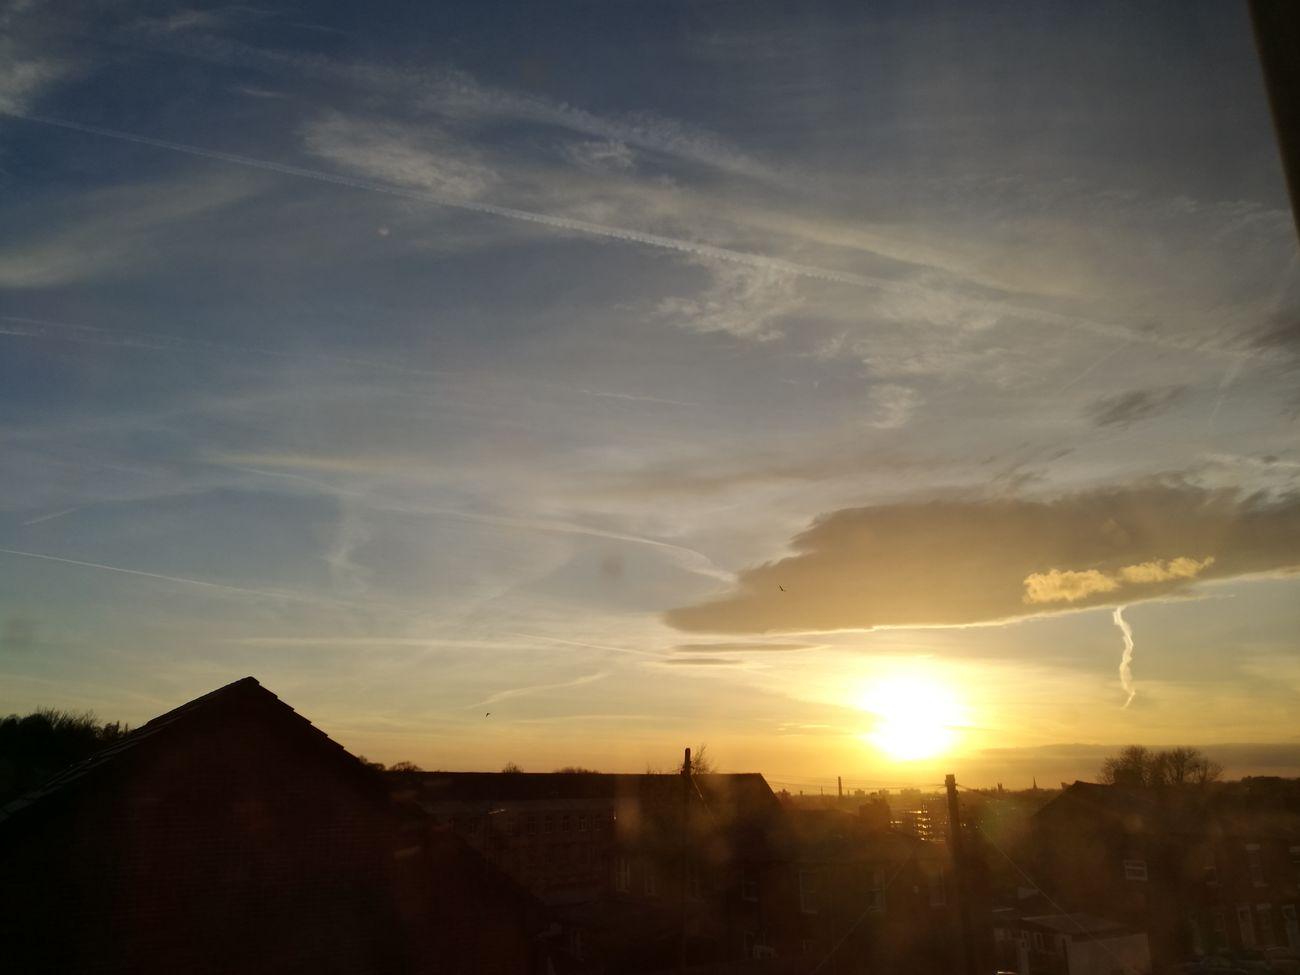 sunset #sun #clouds #skylovers #sky #nature #beautifulinnature #naturalbeauty photography landscape Stalybridge Cheshire